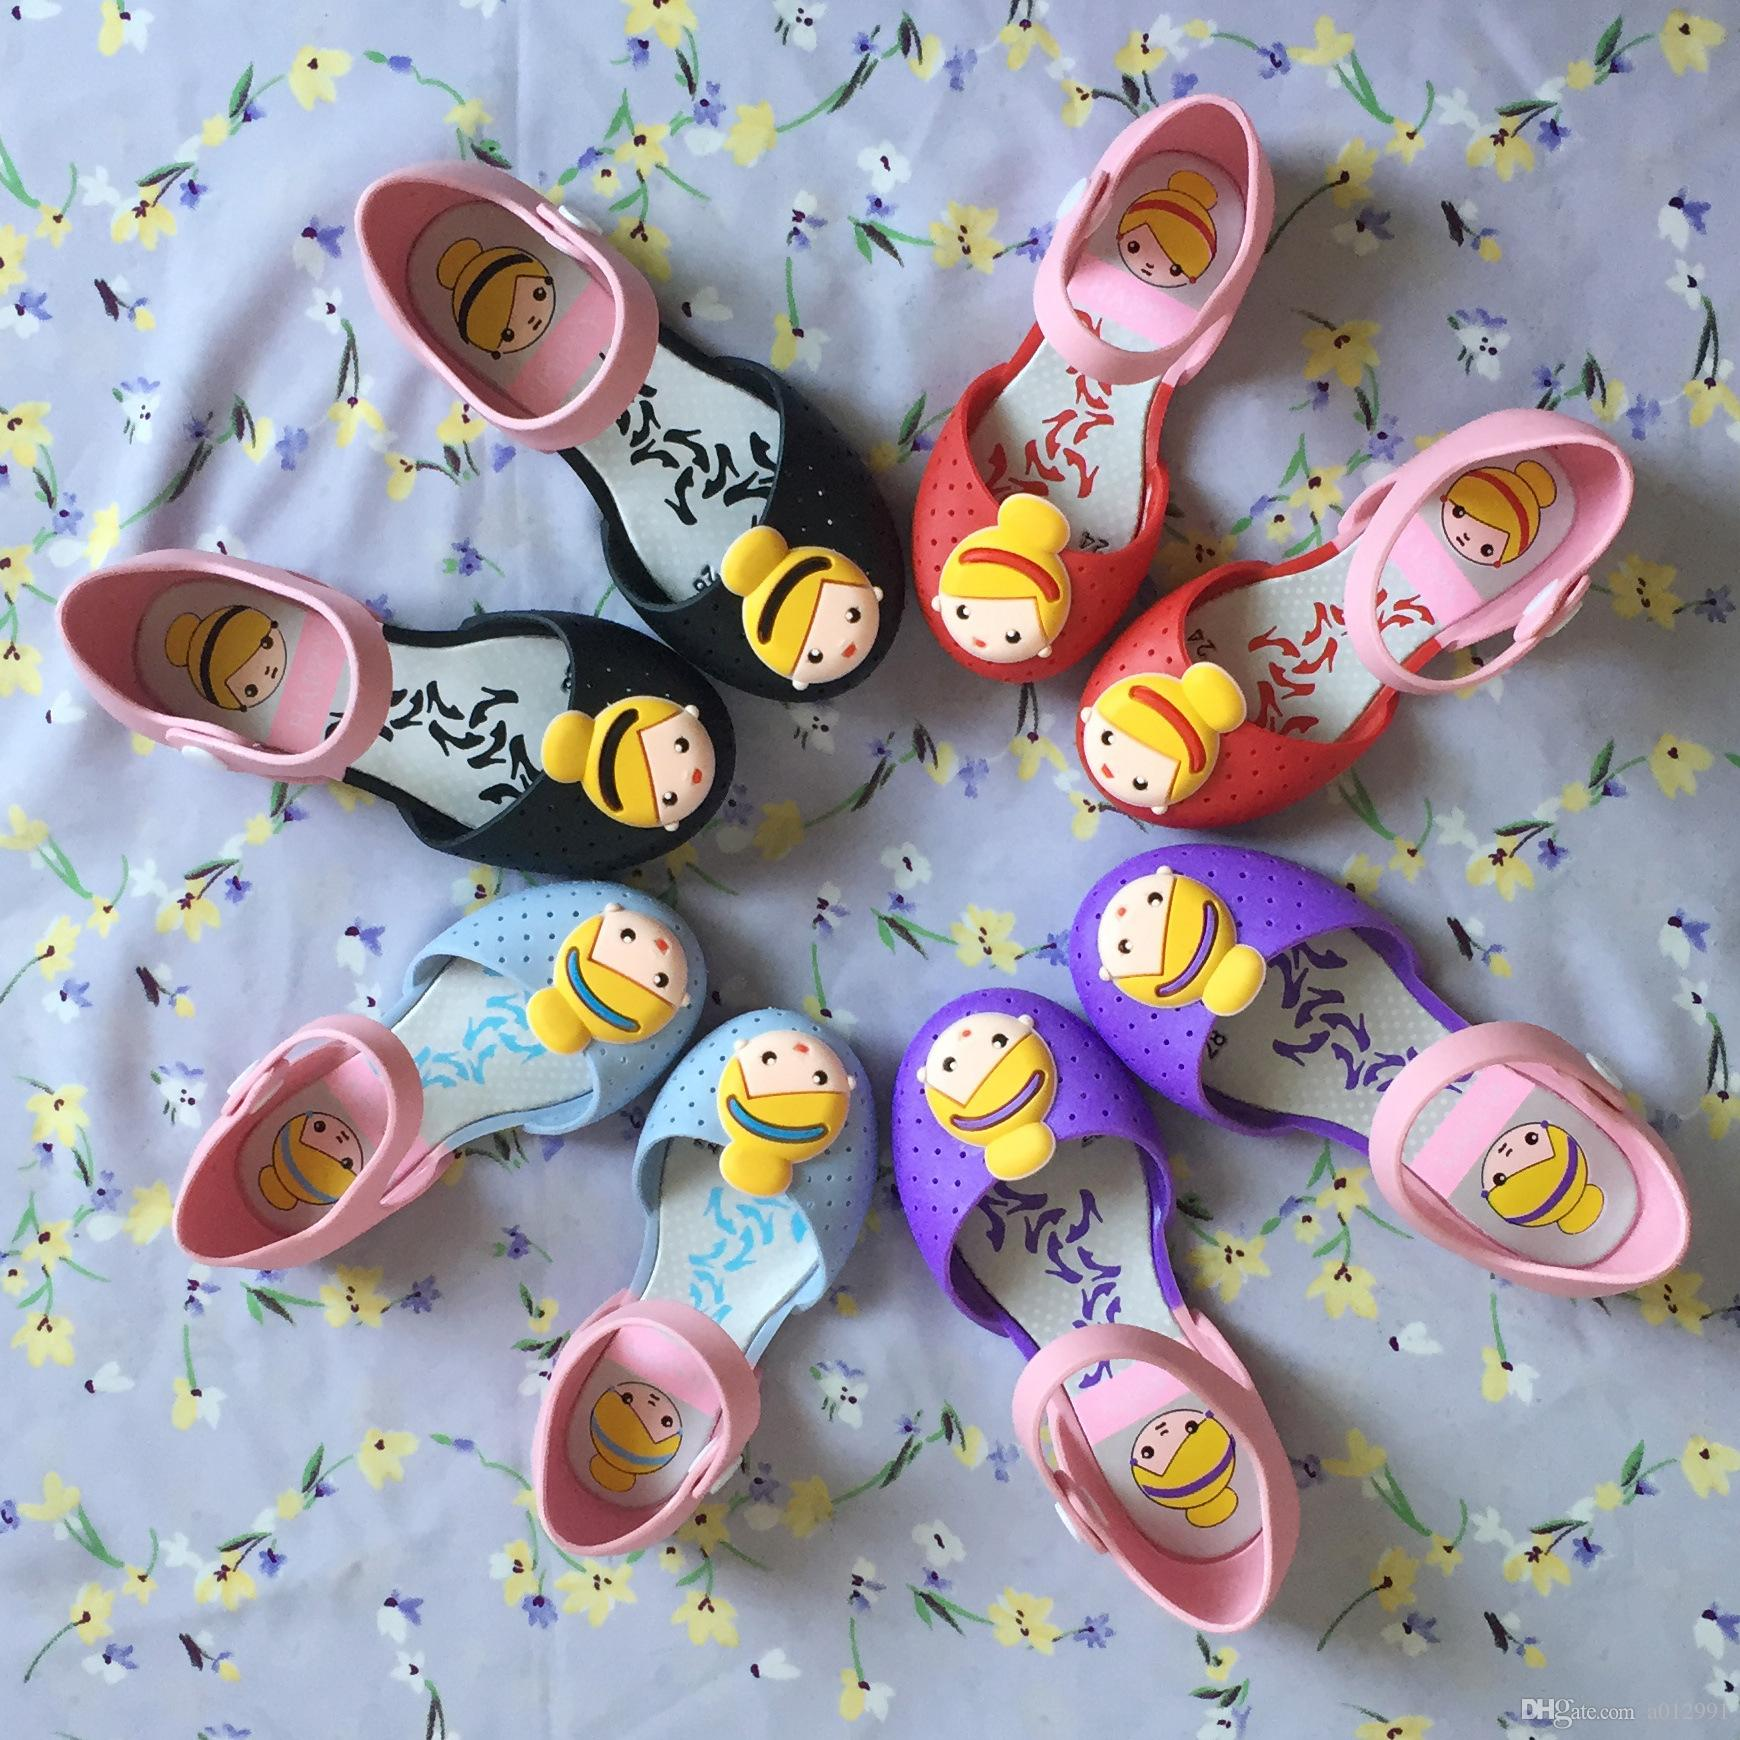 Los Liberan Dhl 2017 Las Melissa Sandalias Mini Compre De Zapatos 2YHIED9eW